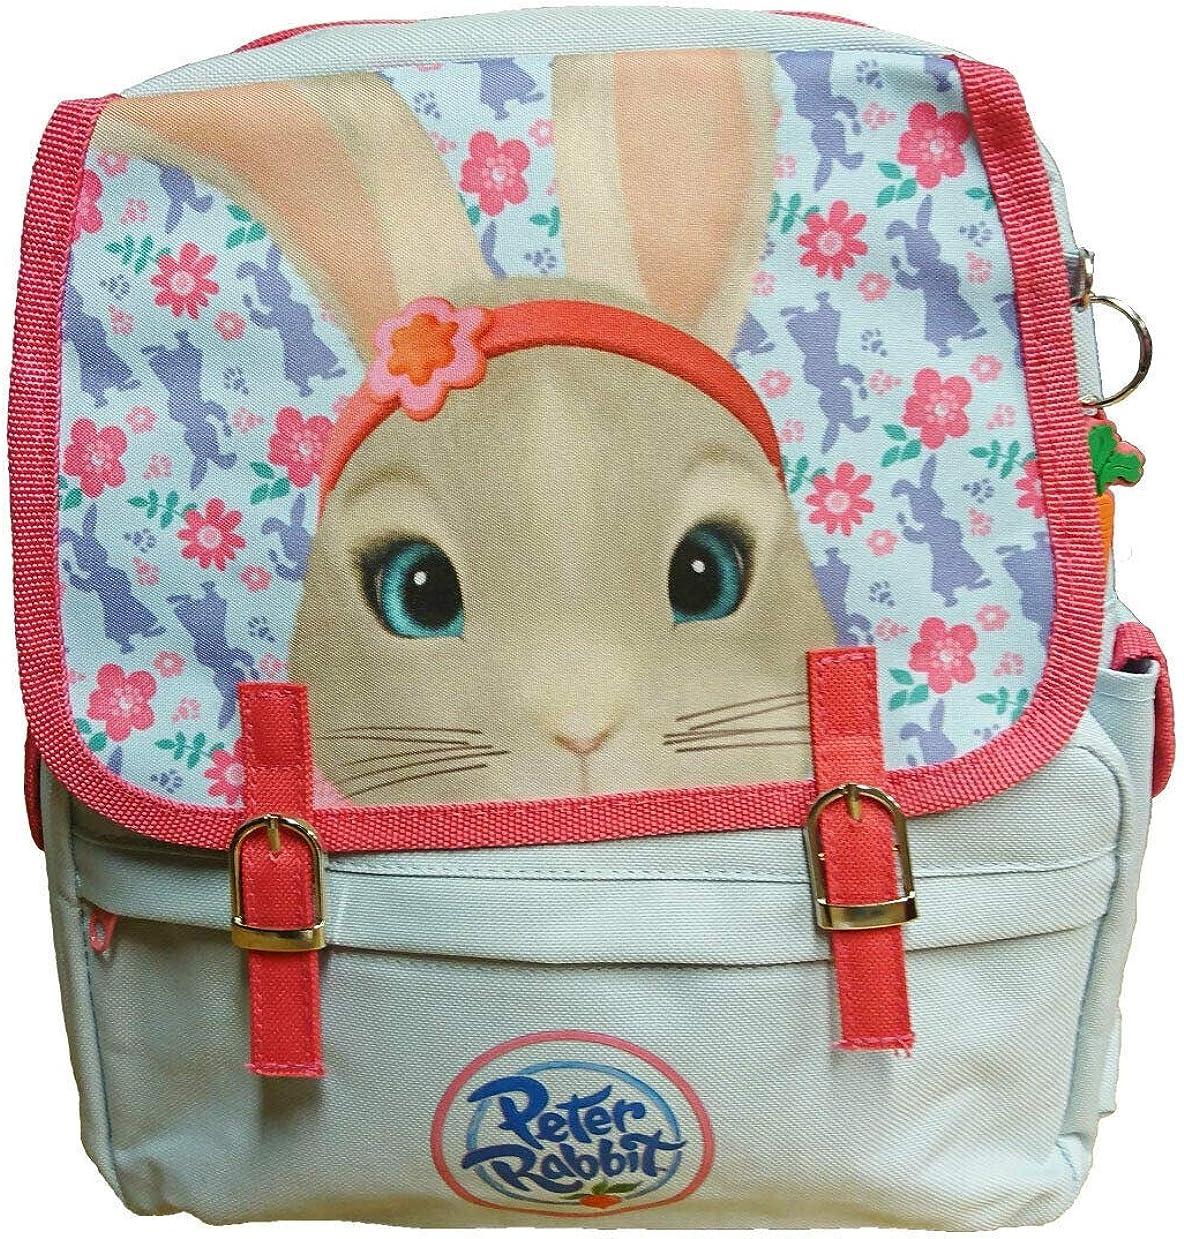 Peter Rabbit Lily Bobtail Floral Blue /& Pink Girl/'s Backpack School Bag